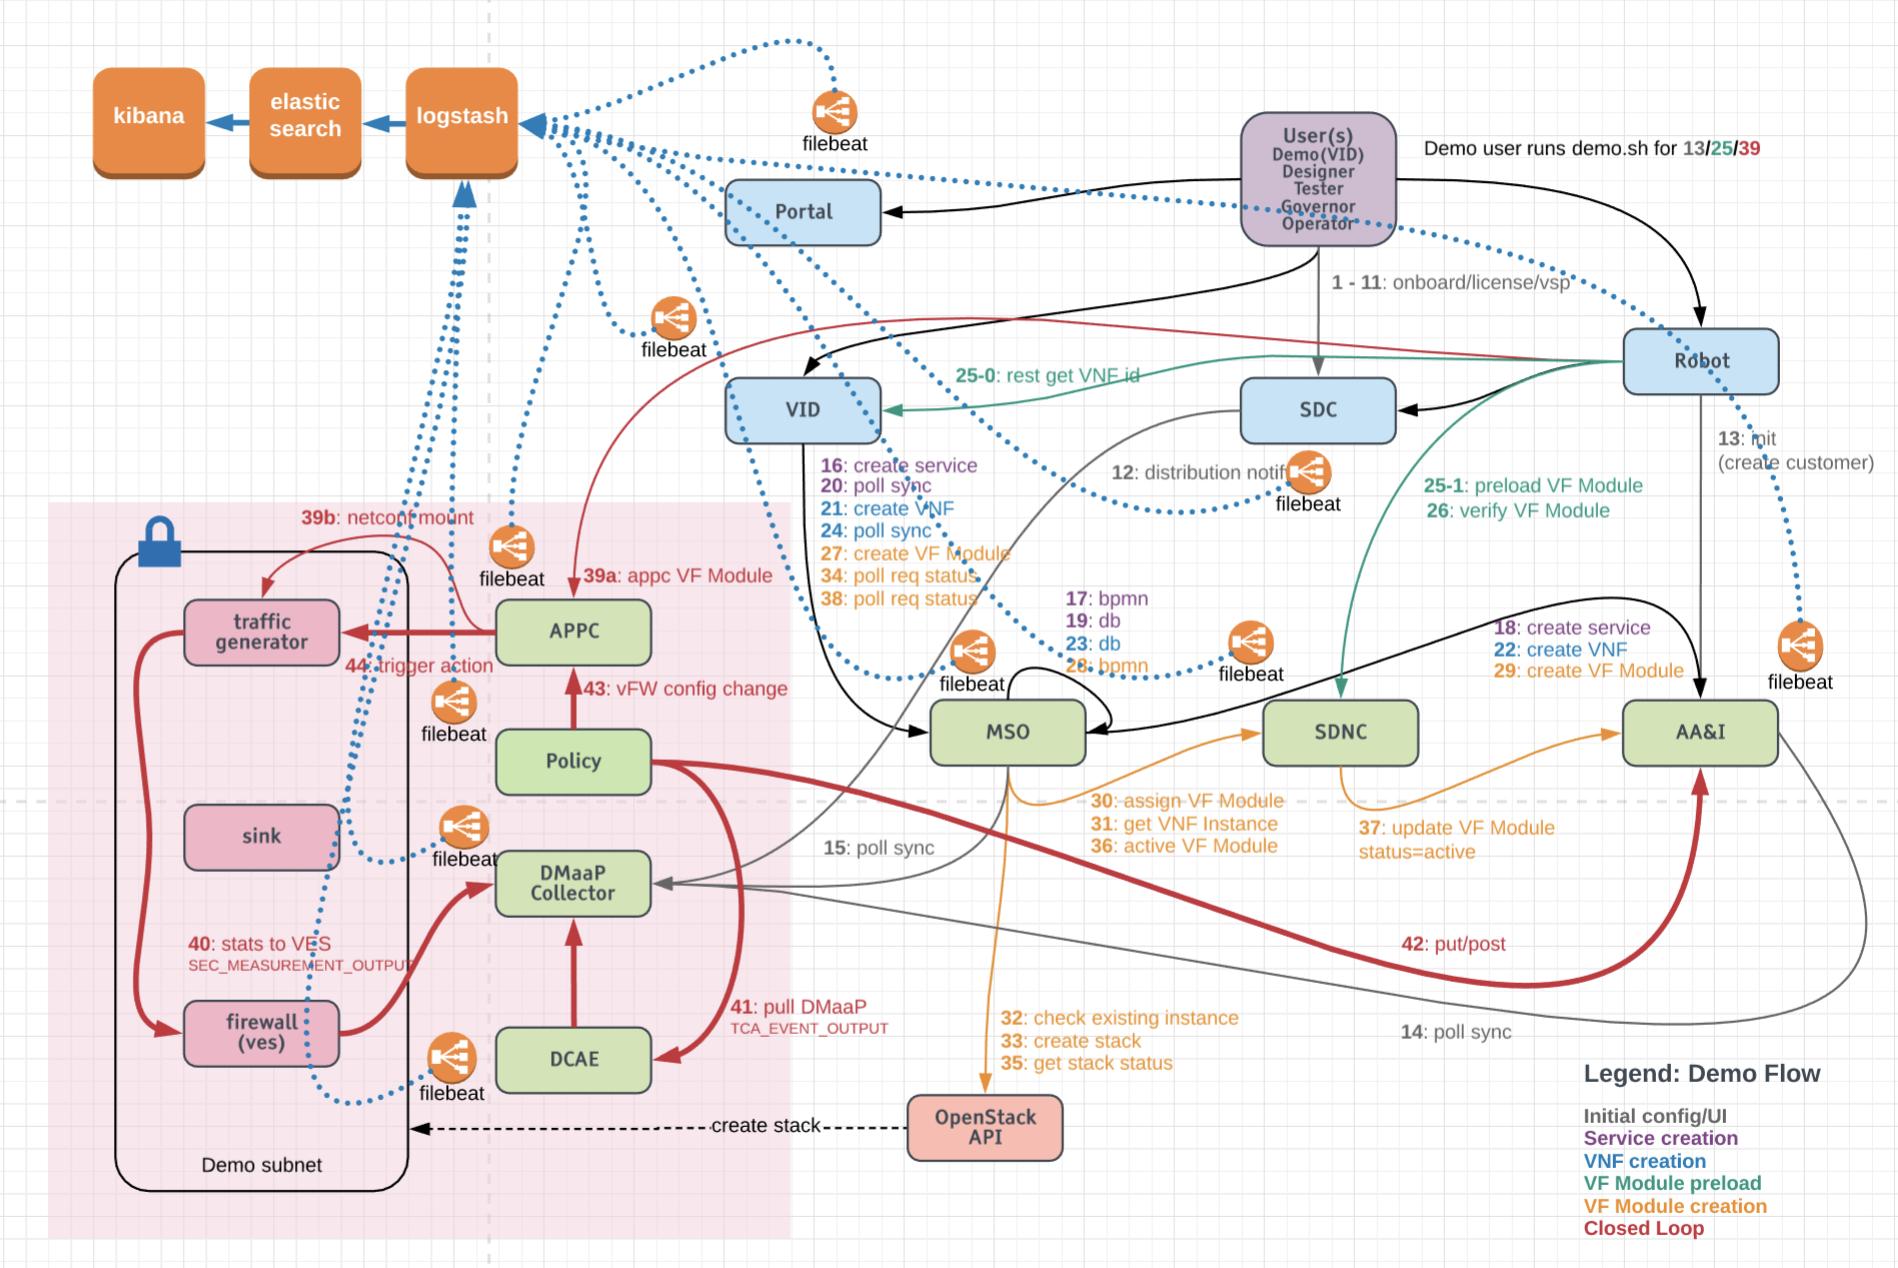 LOG M1 Beijing Release Planning - Developer Wiki - Confluence